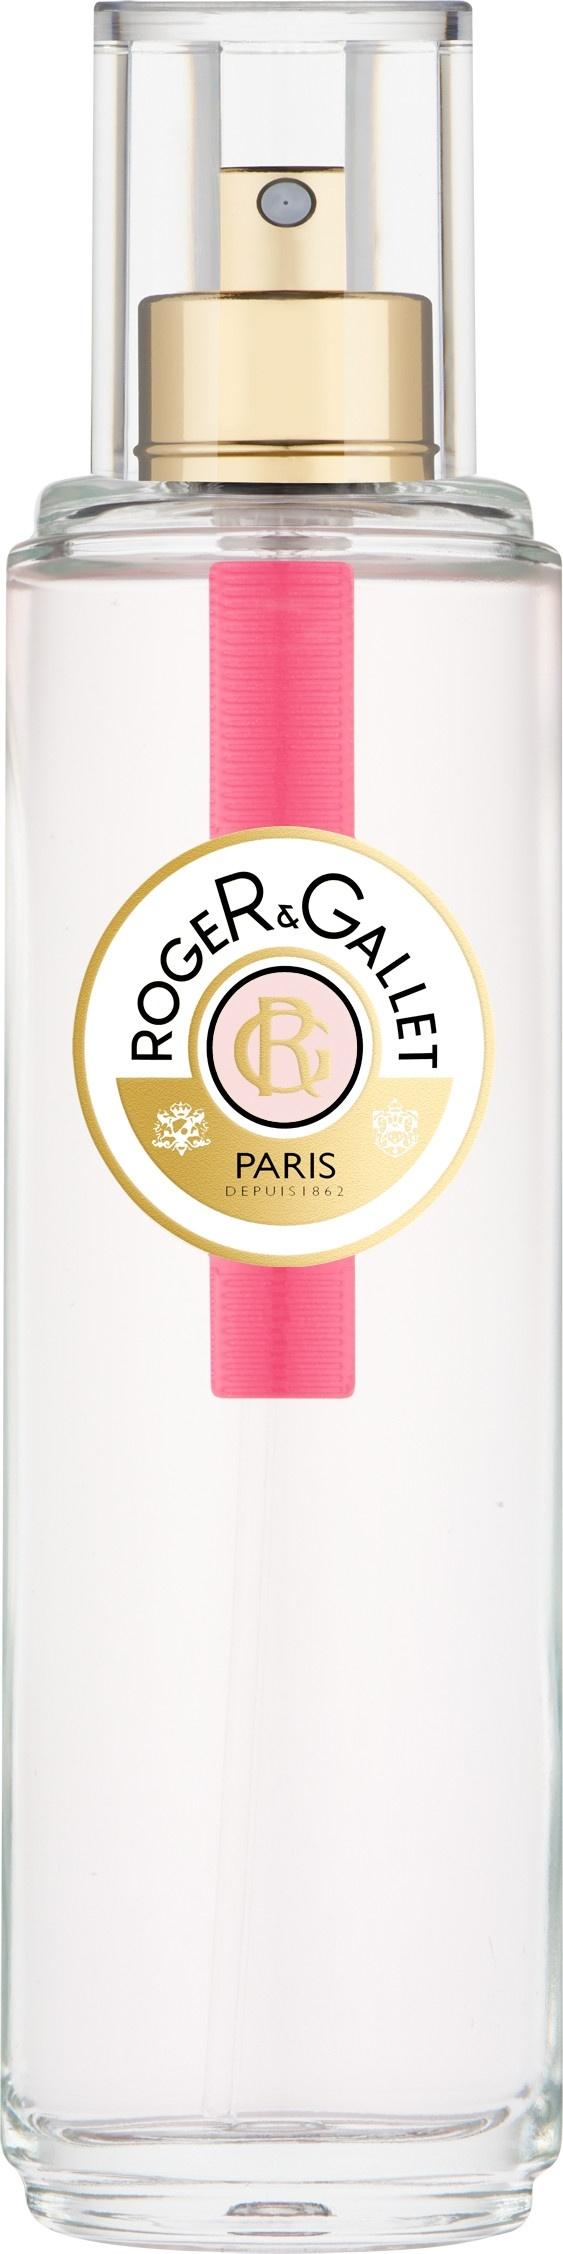 Roger & Gallet Rose Fragrant Water Spray 30ml